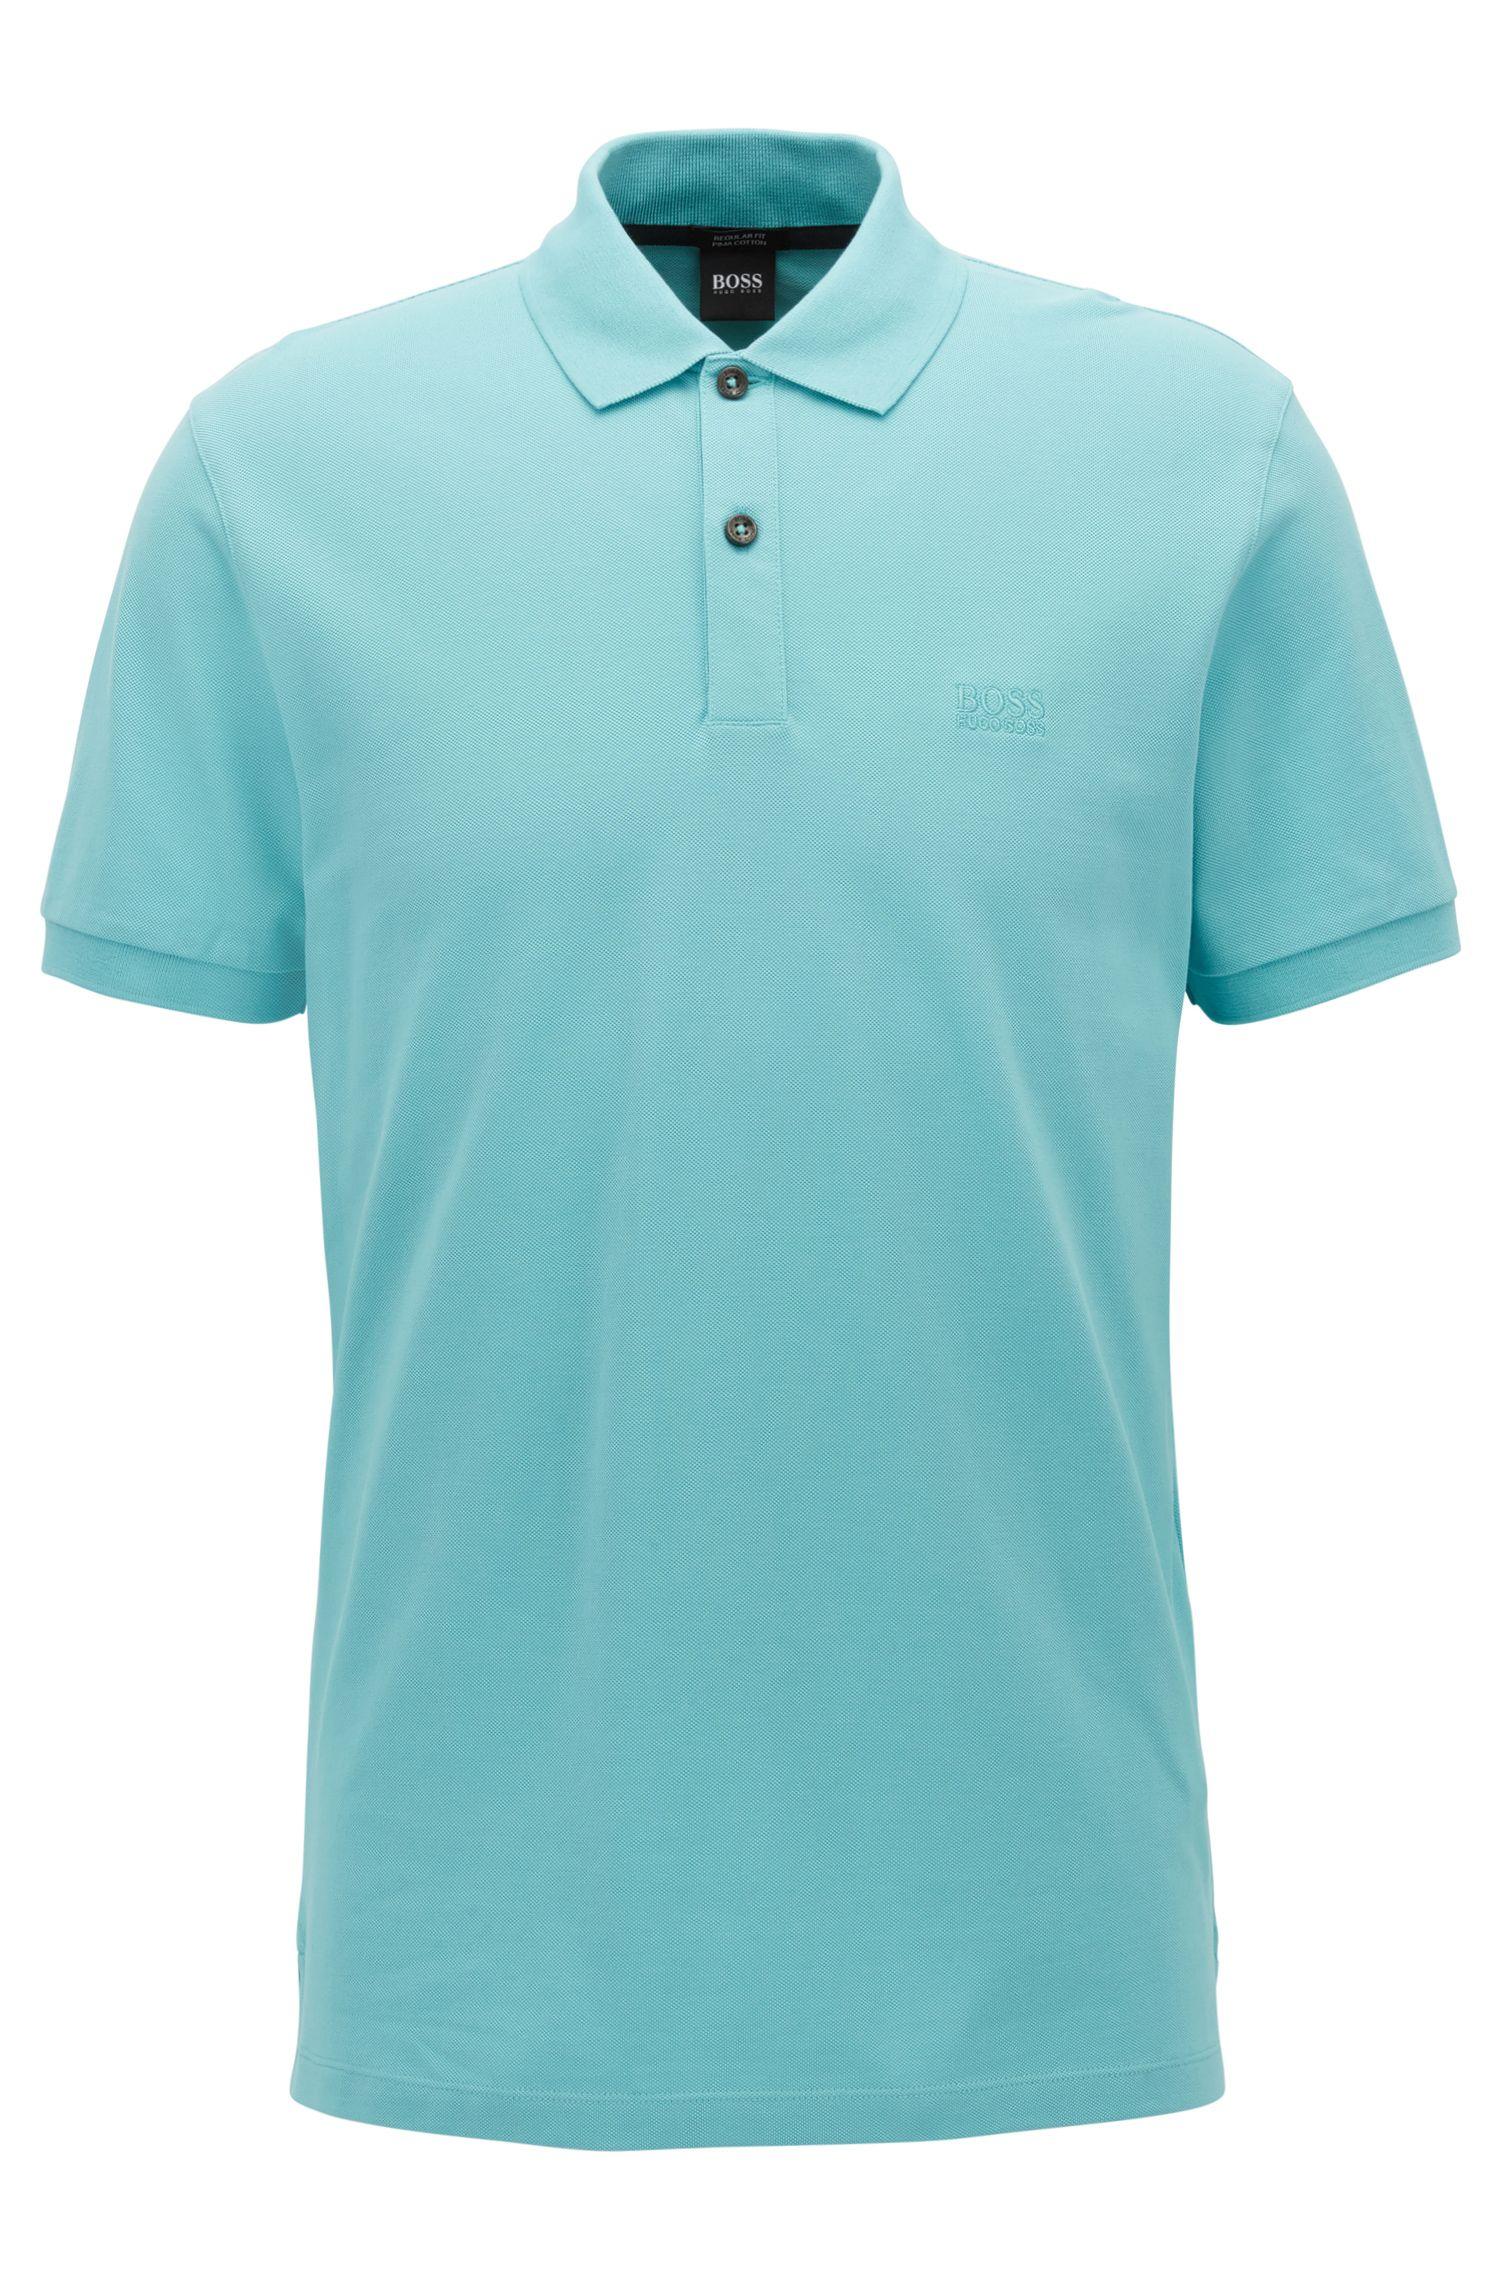 Regular-fit polo shirt in fine piqué